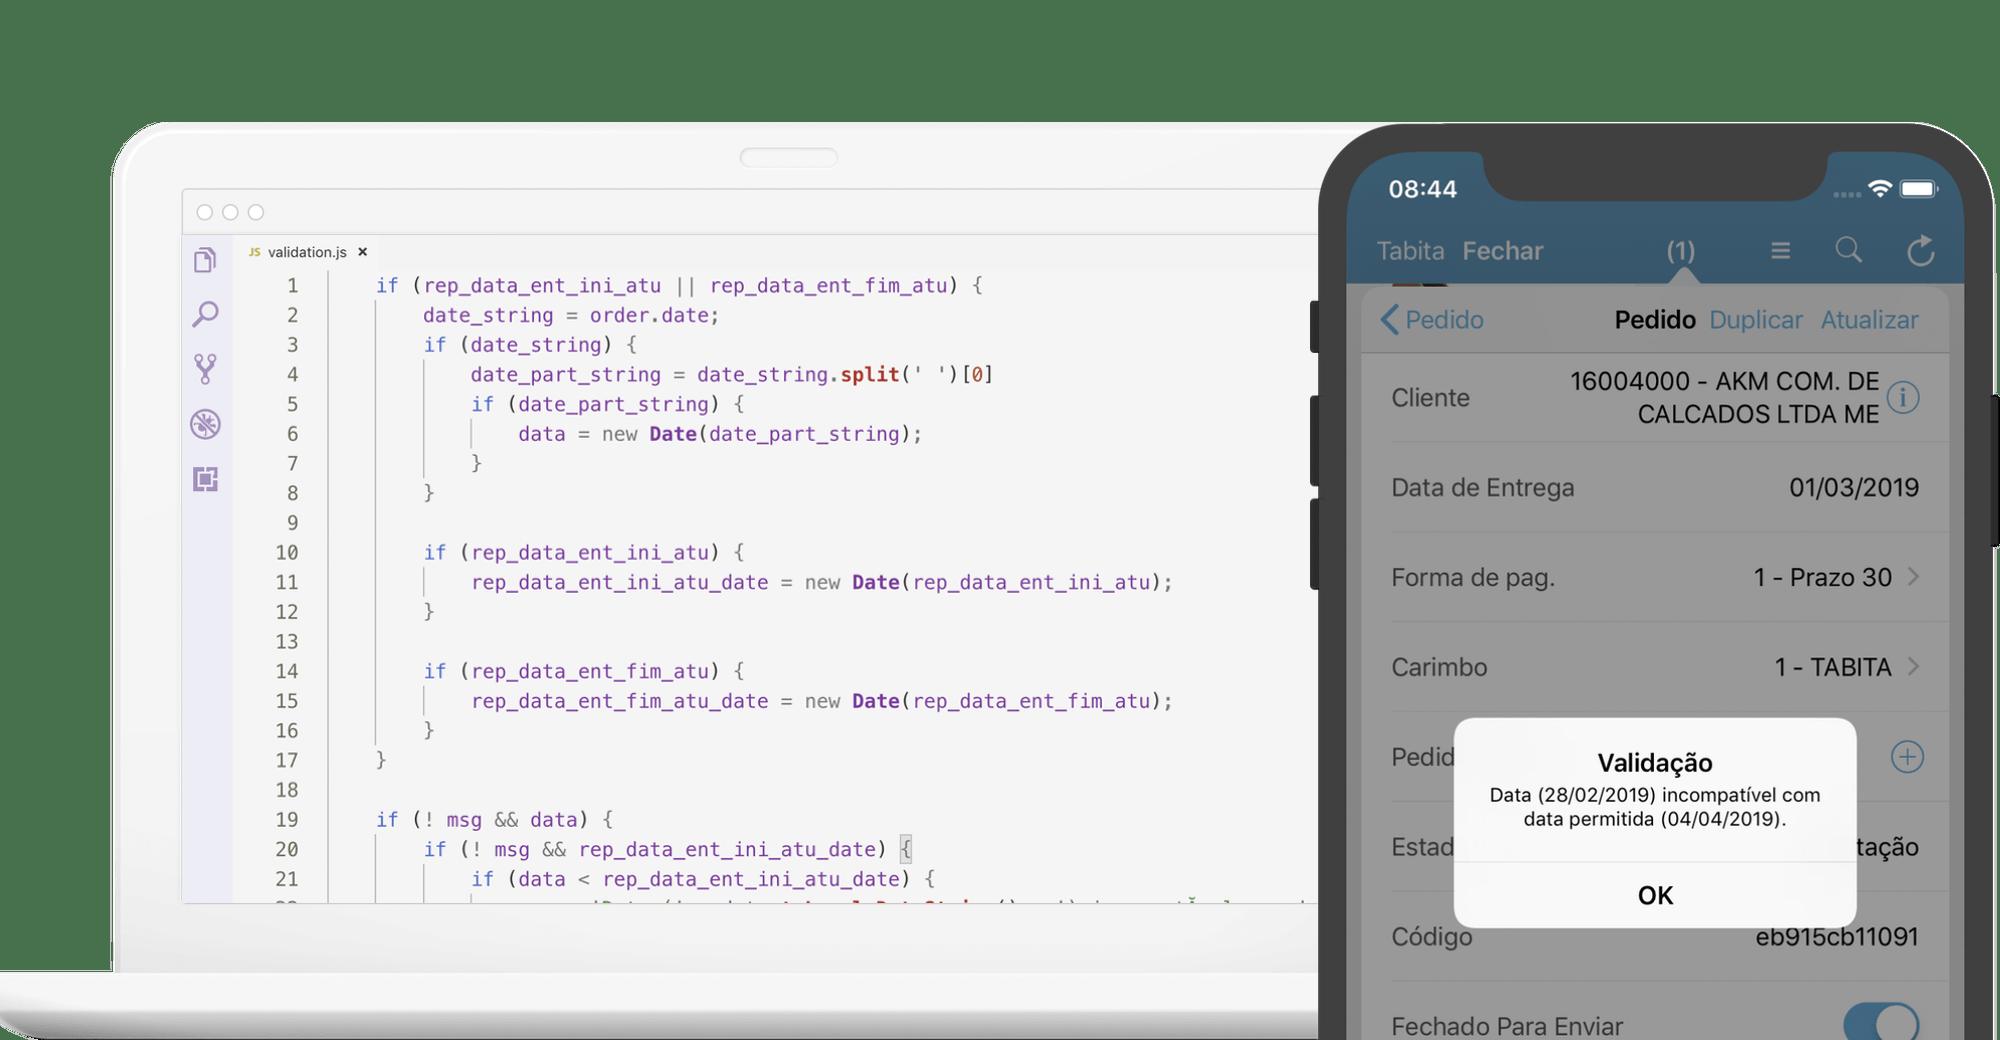 Embedded Scripting